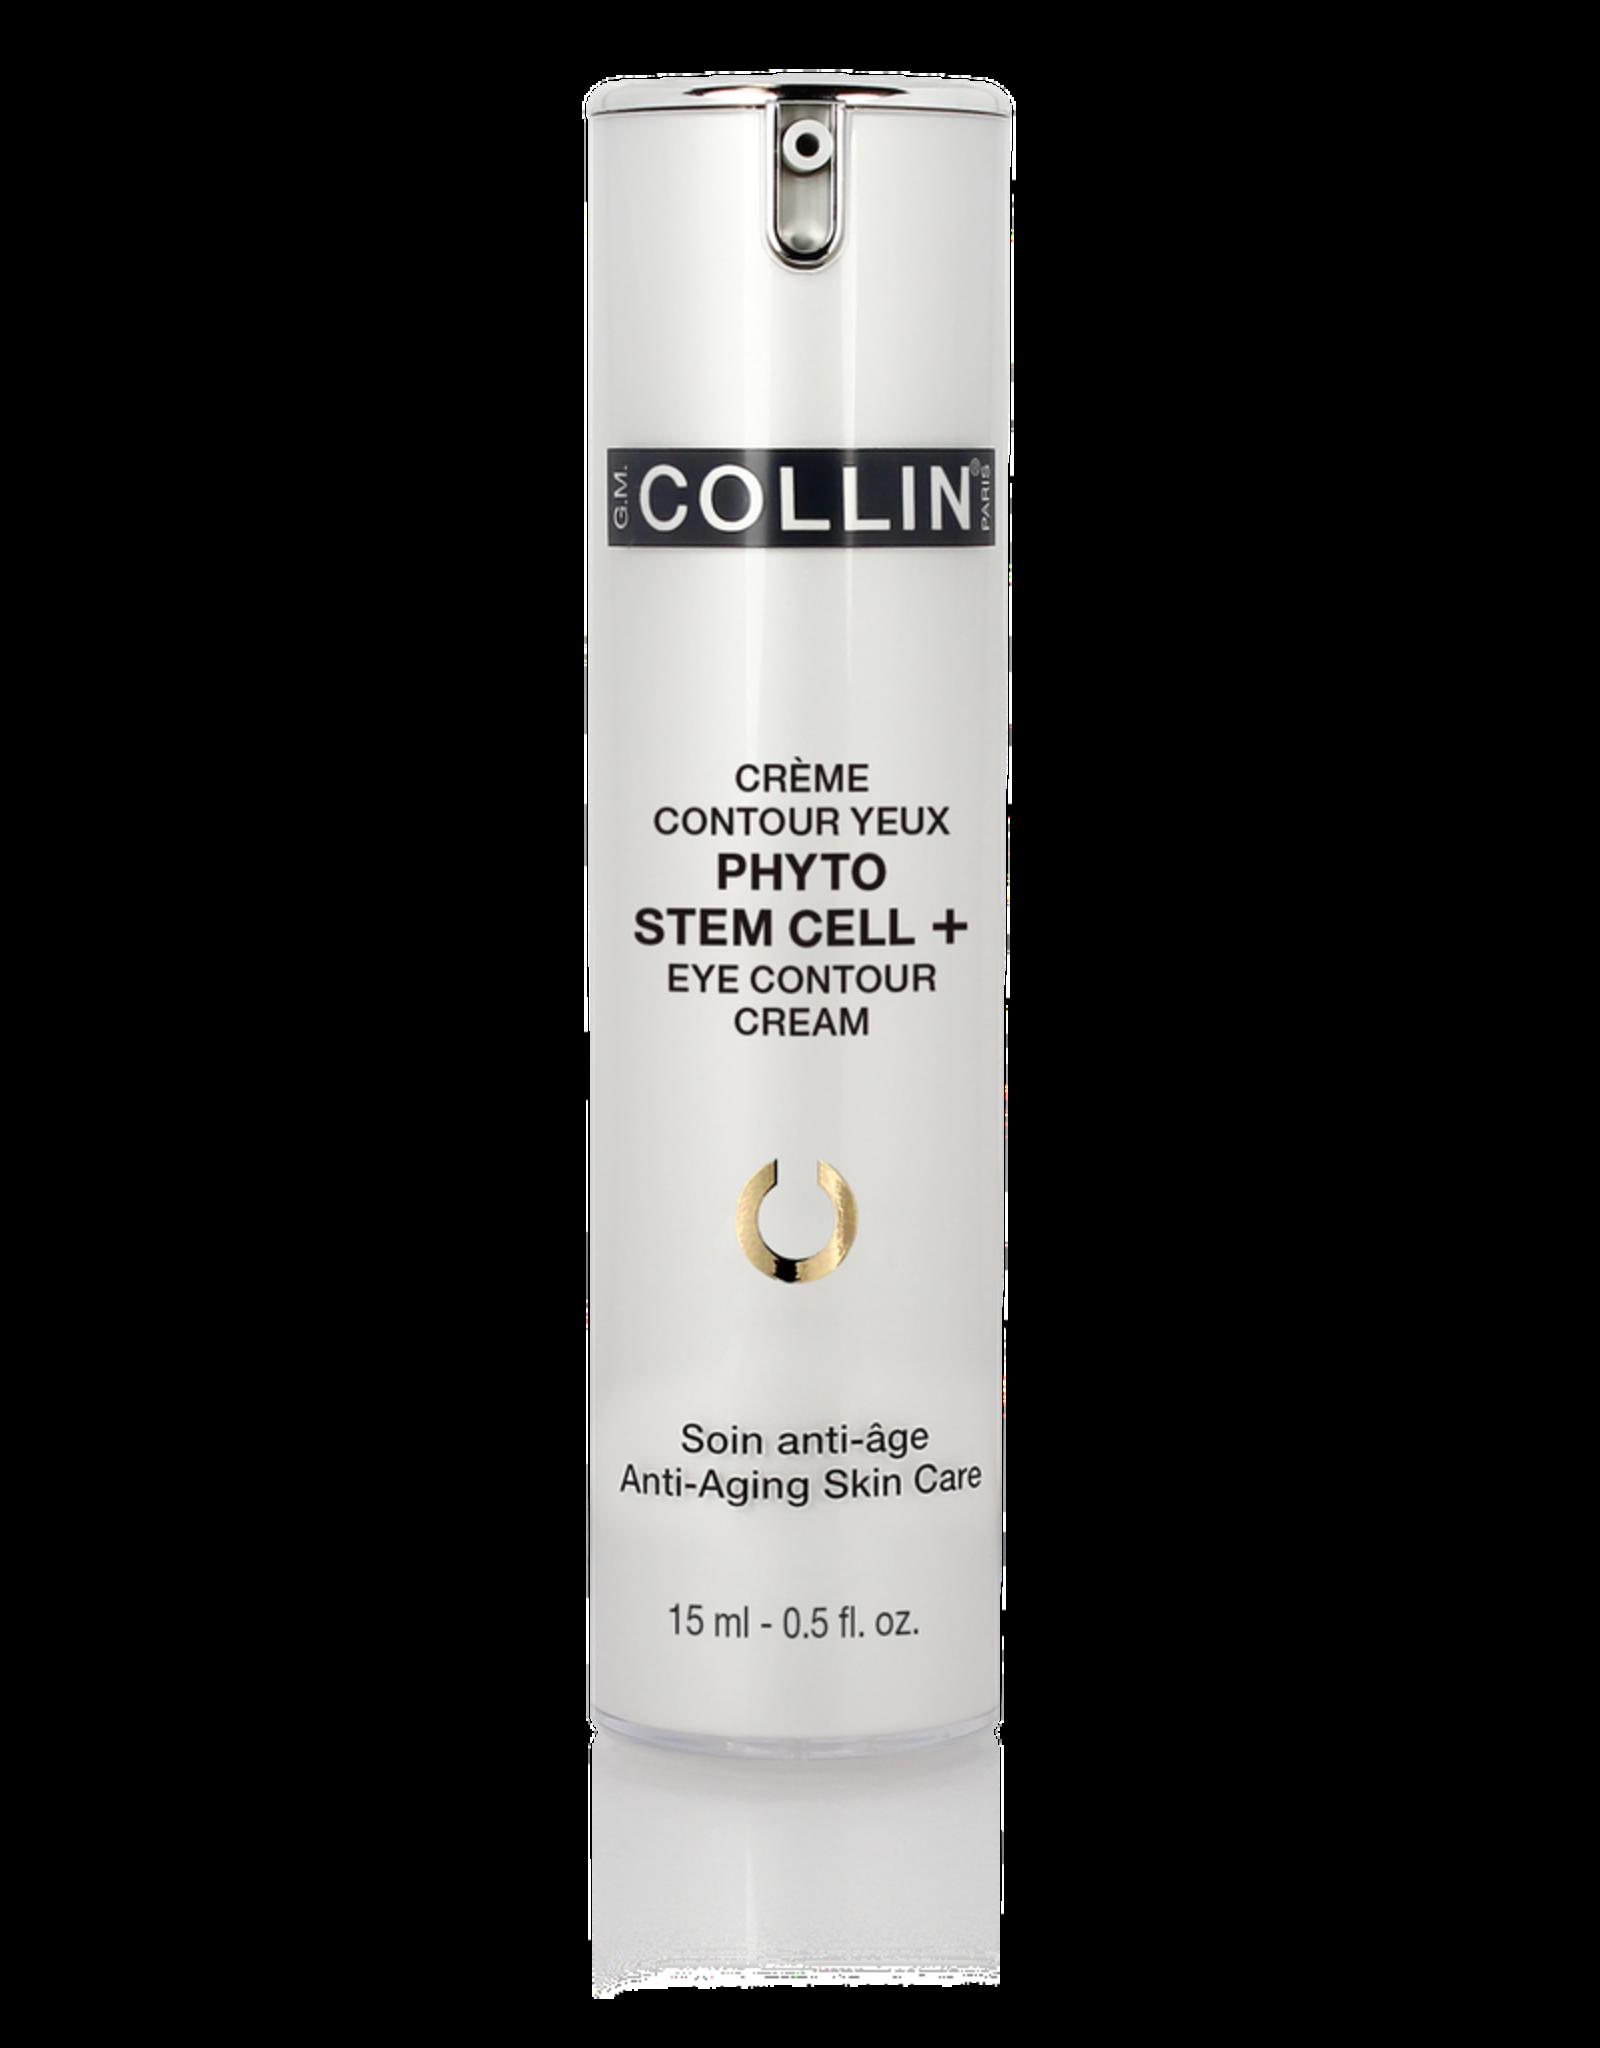 GM Collin G.M. Collin Phyto Stem Cell+ Eye Contour Cream, 15ml